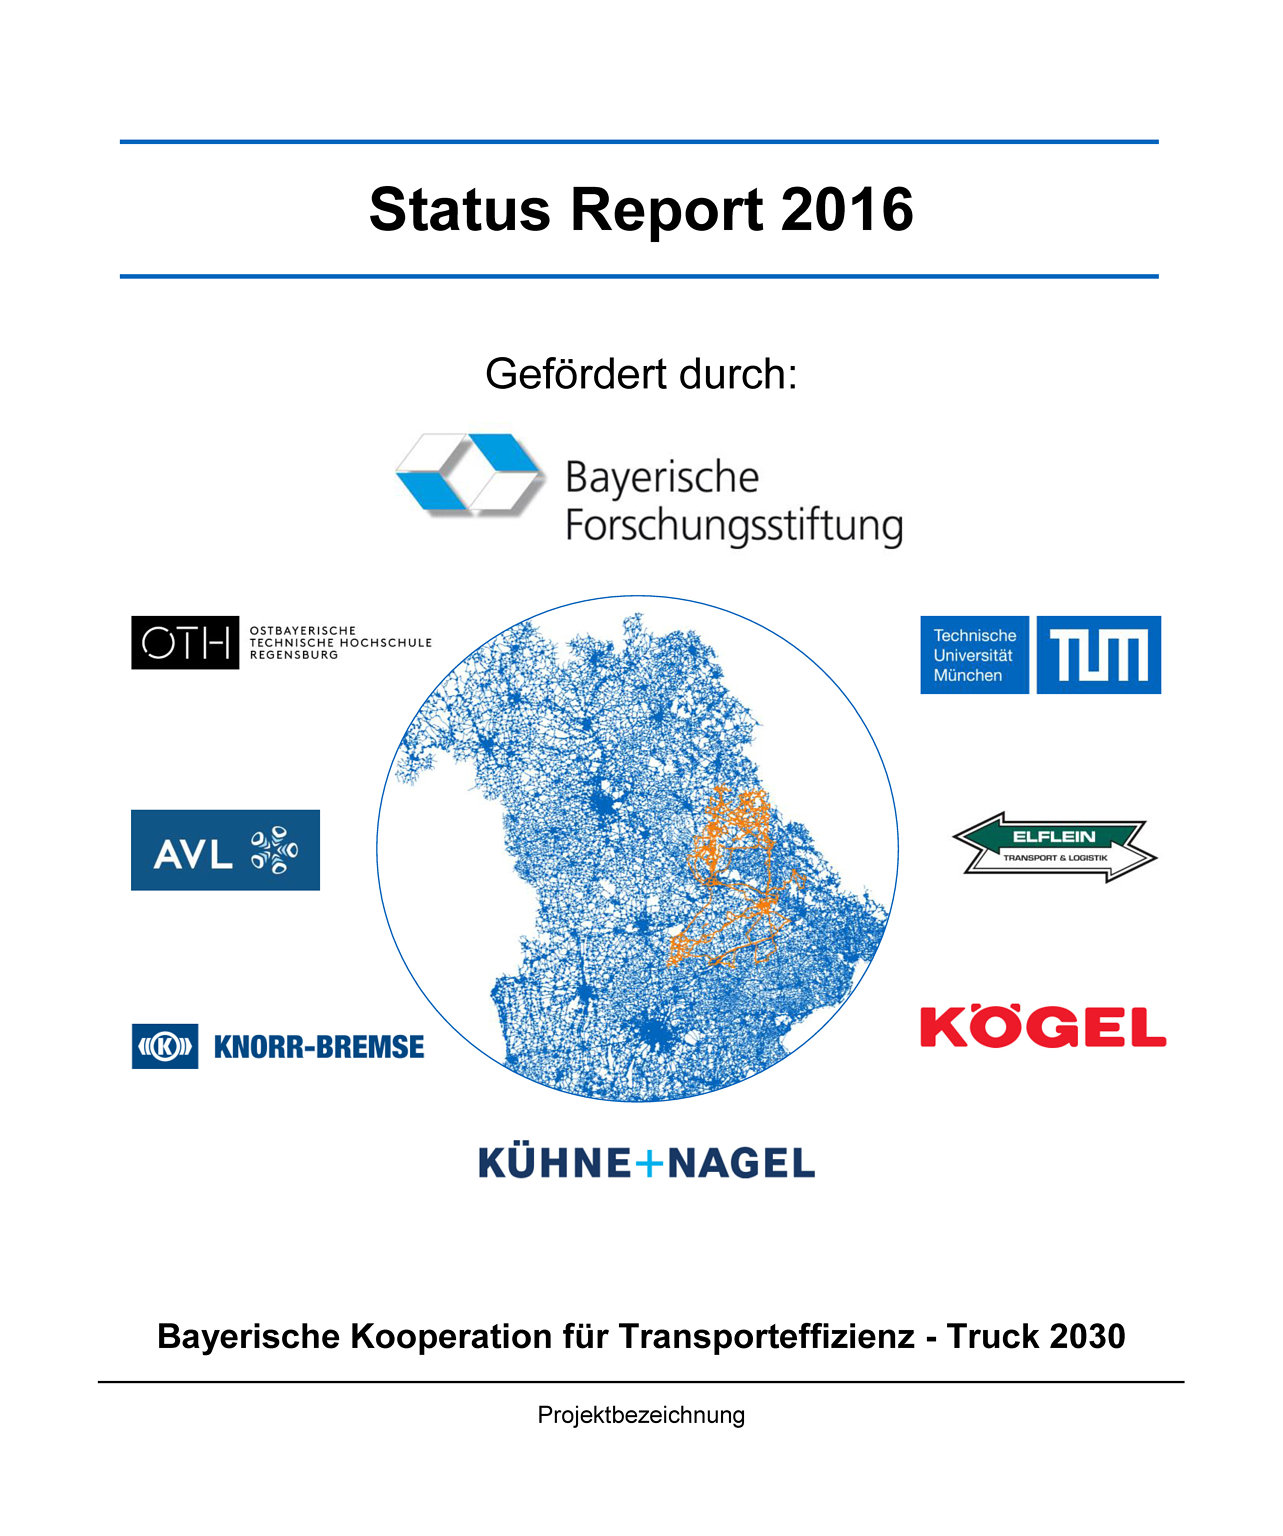 Truck 2030 Statusreport 2016